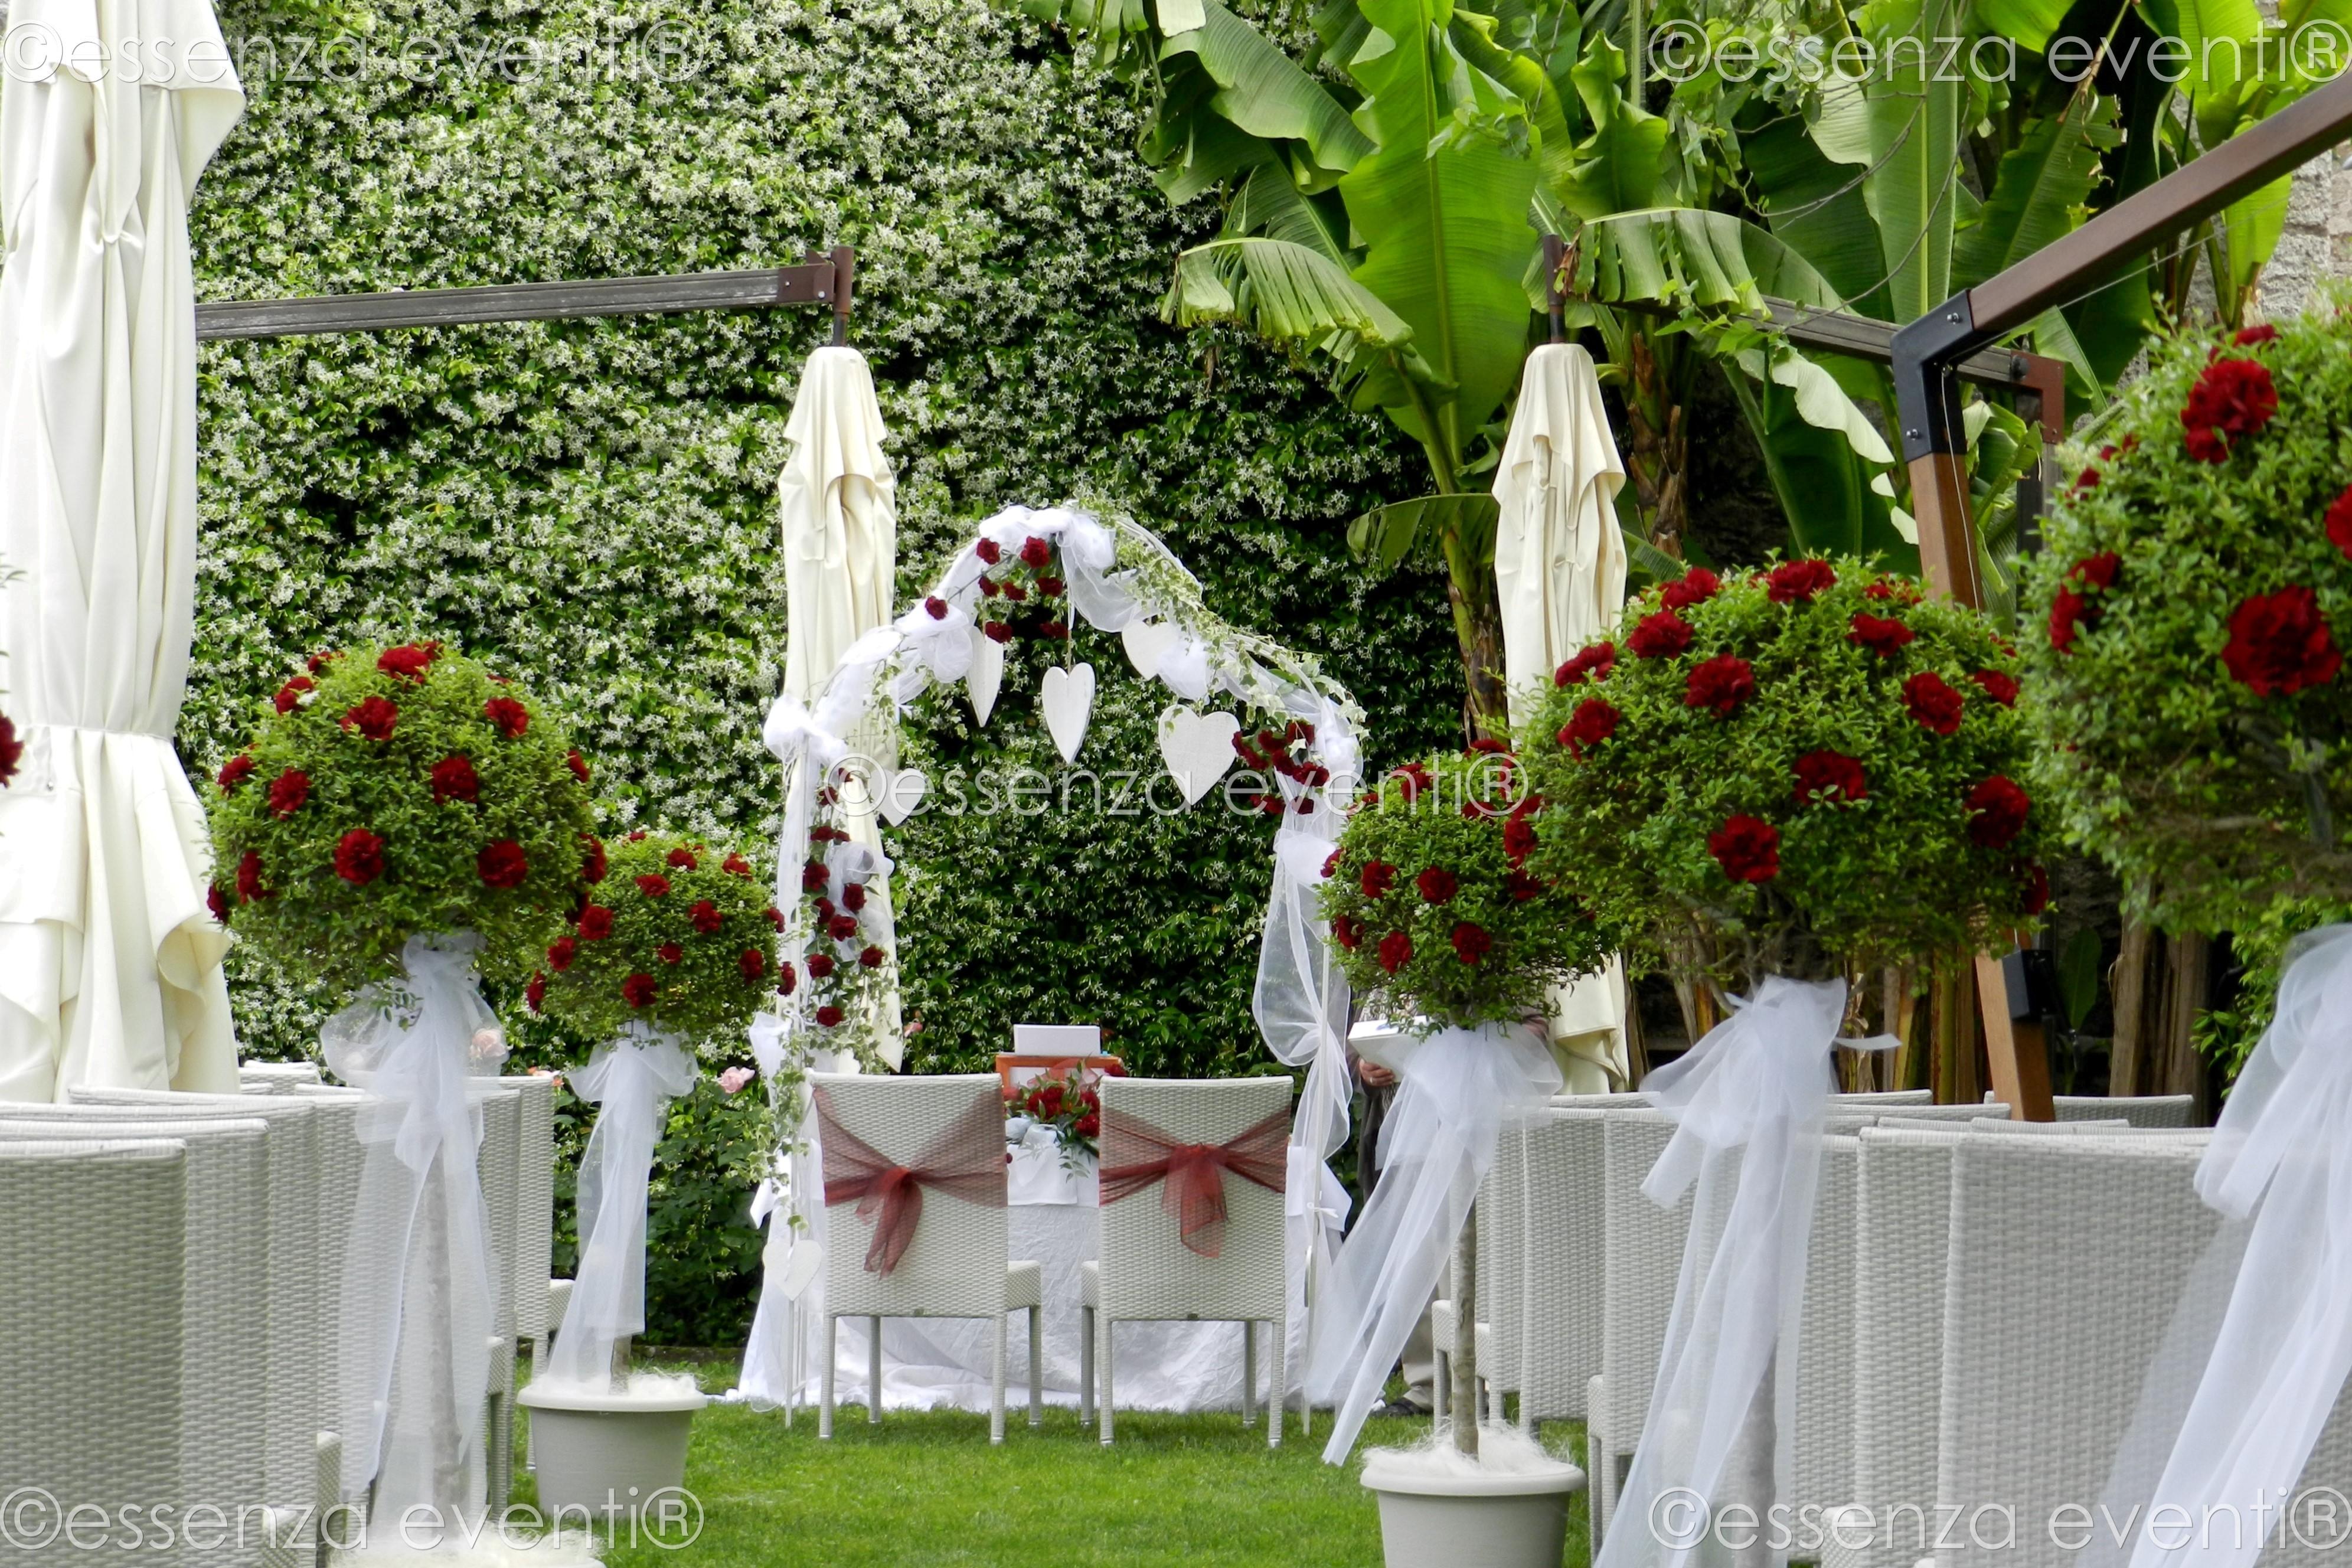 Celebrante Matrimonio Simbolico Liguria : Cerimonia antonio e alina essenza eventi celebrante